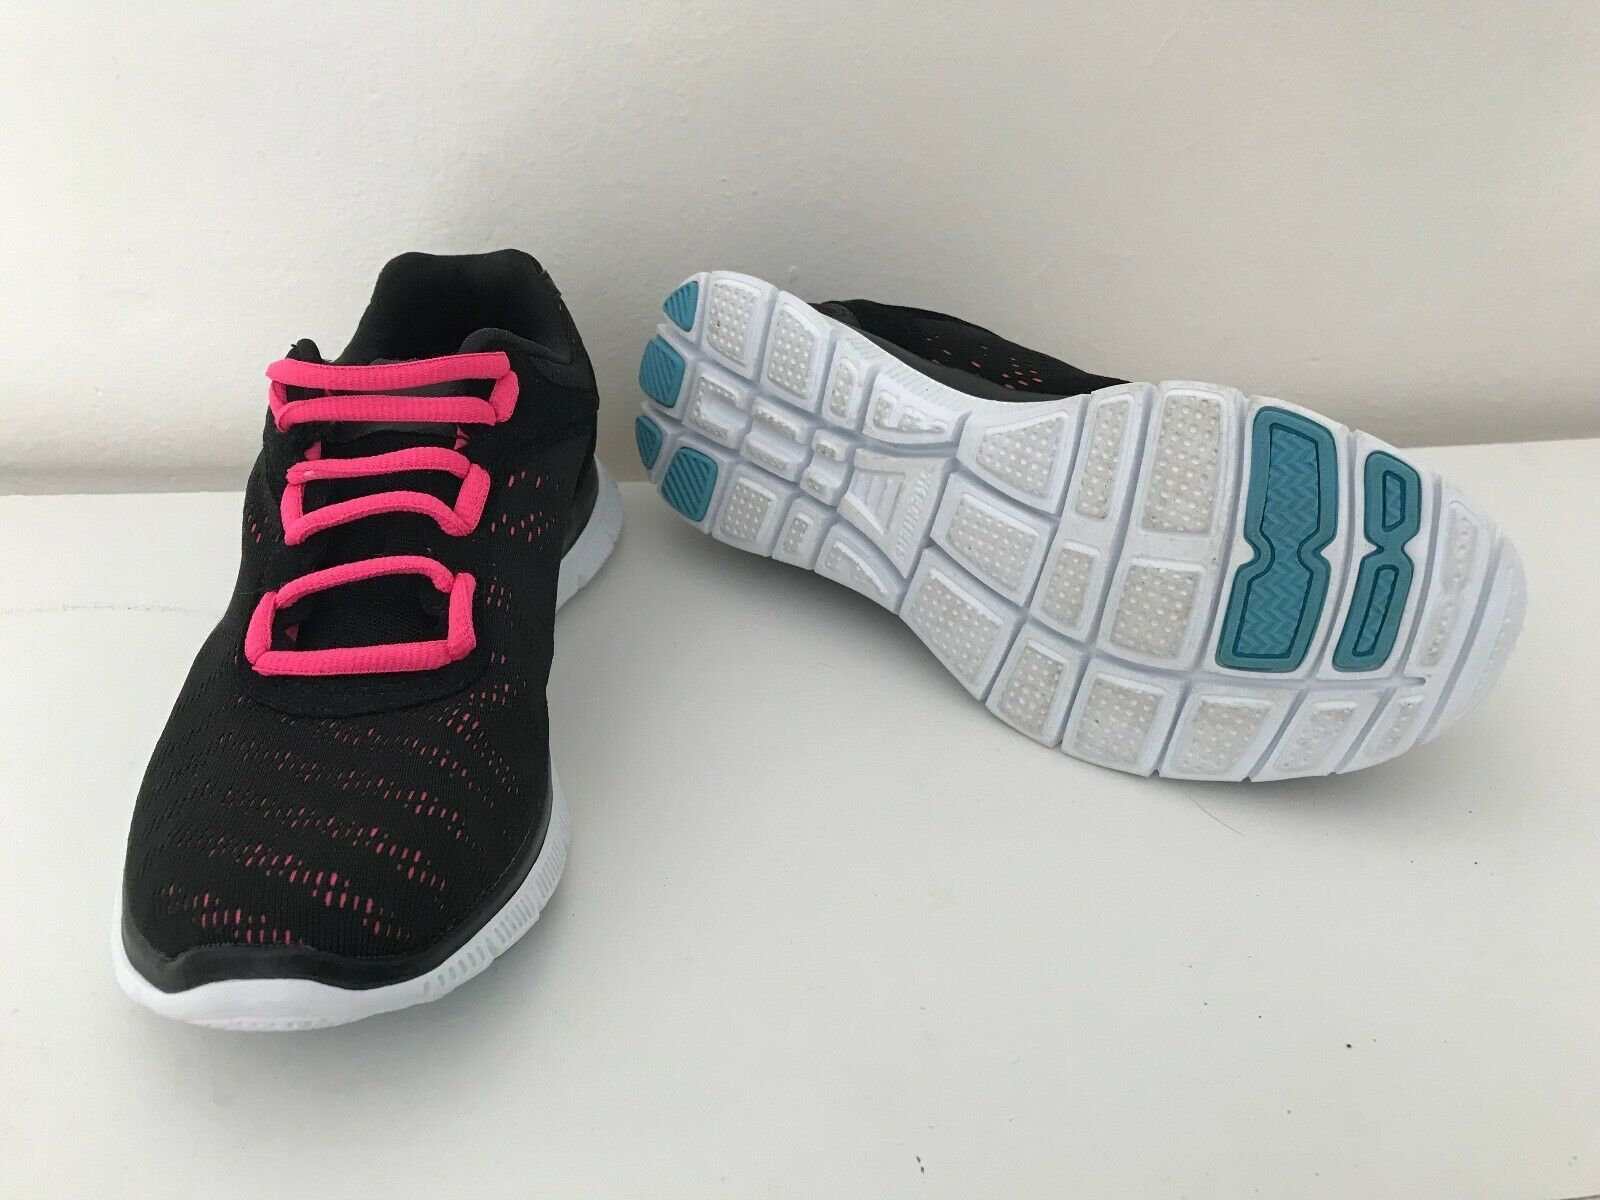 Sketchers Sketch Knit Memory Foam Womens Sneaker Size 6 5 Sketcher Shoes Ideas Of Sketcher Shoes Sketcher Shoes Sketchers S Sketchers Shoes Sketchers Shoes